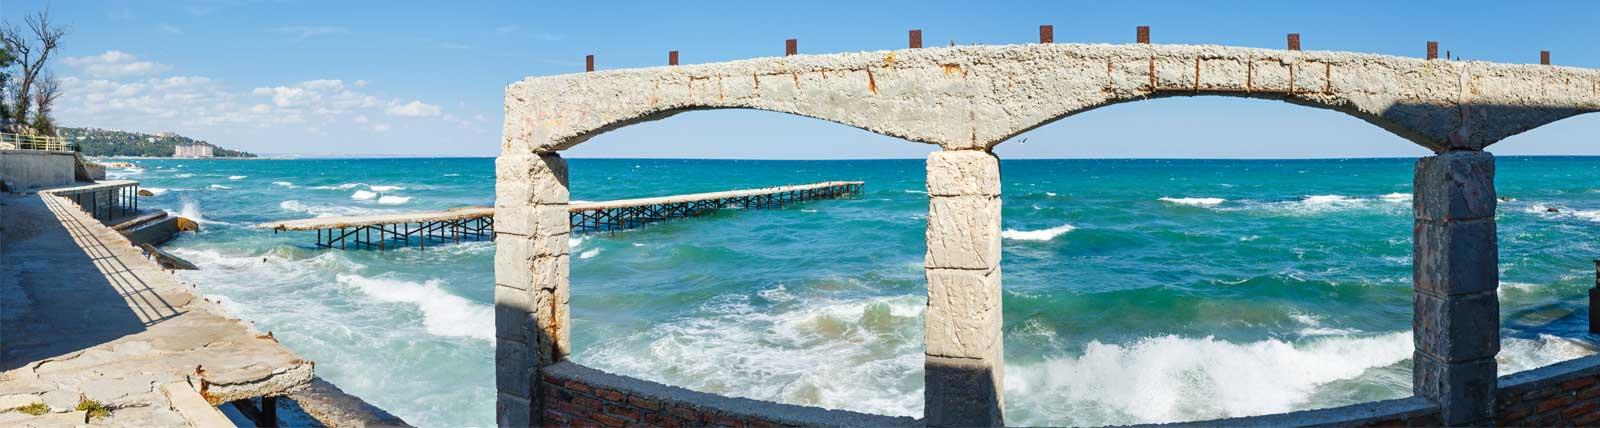 Ferienwohnung Bulgarien, Nordosten Bulgariens, Schwarzen Meer, Blagoevo